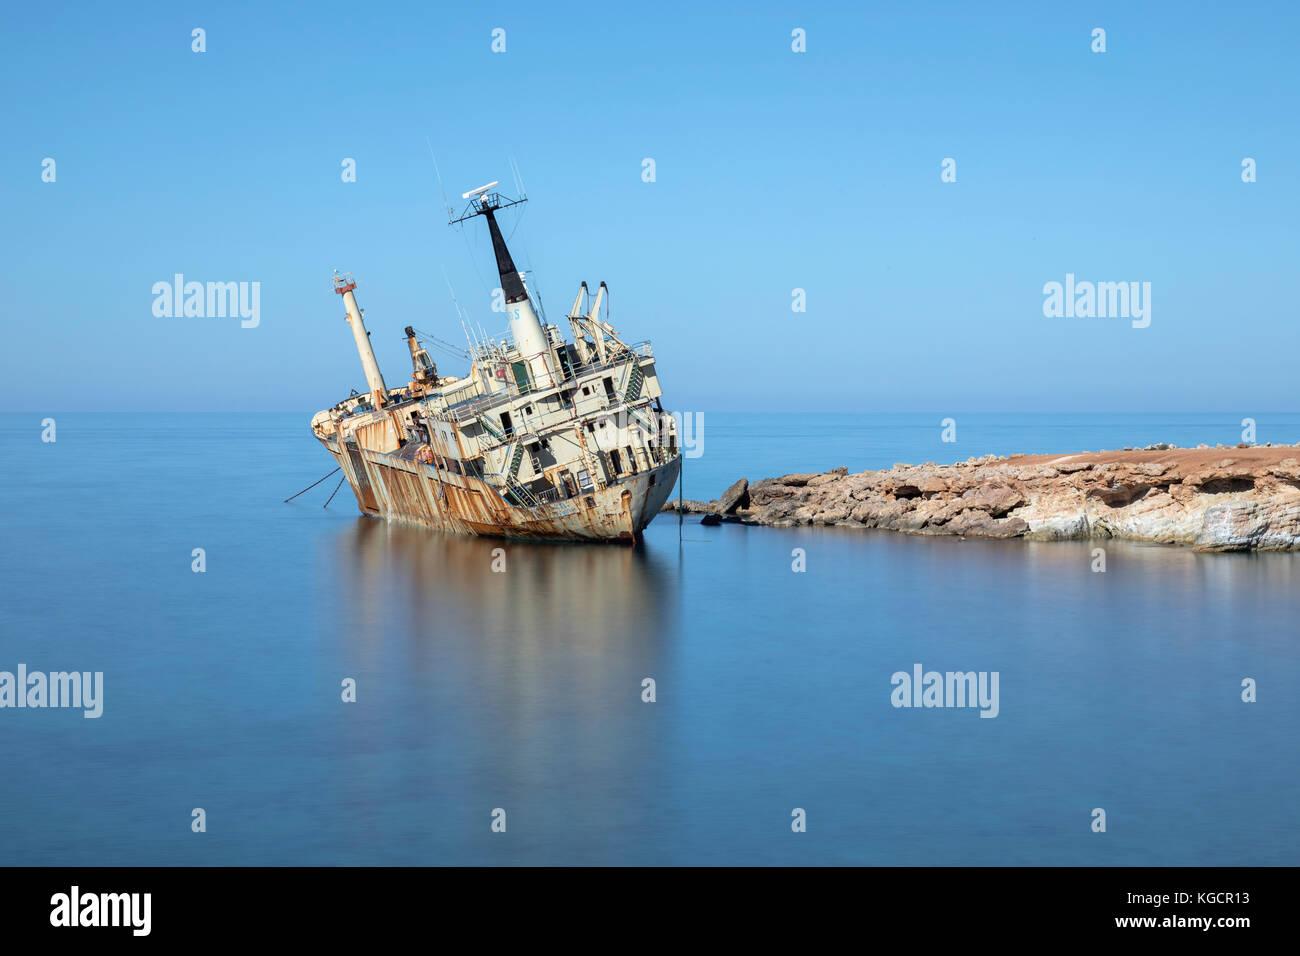 Edro III shipwreck, Pegeia, Paphos, Cyprus - Stock Image